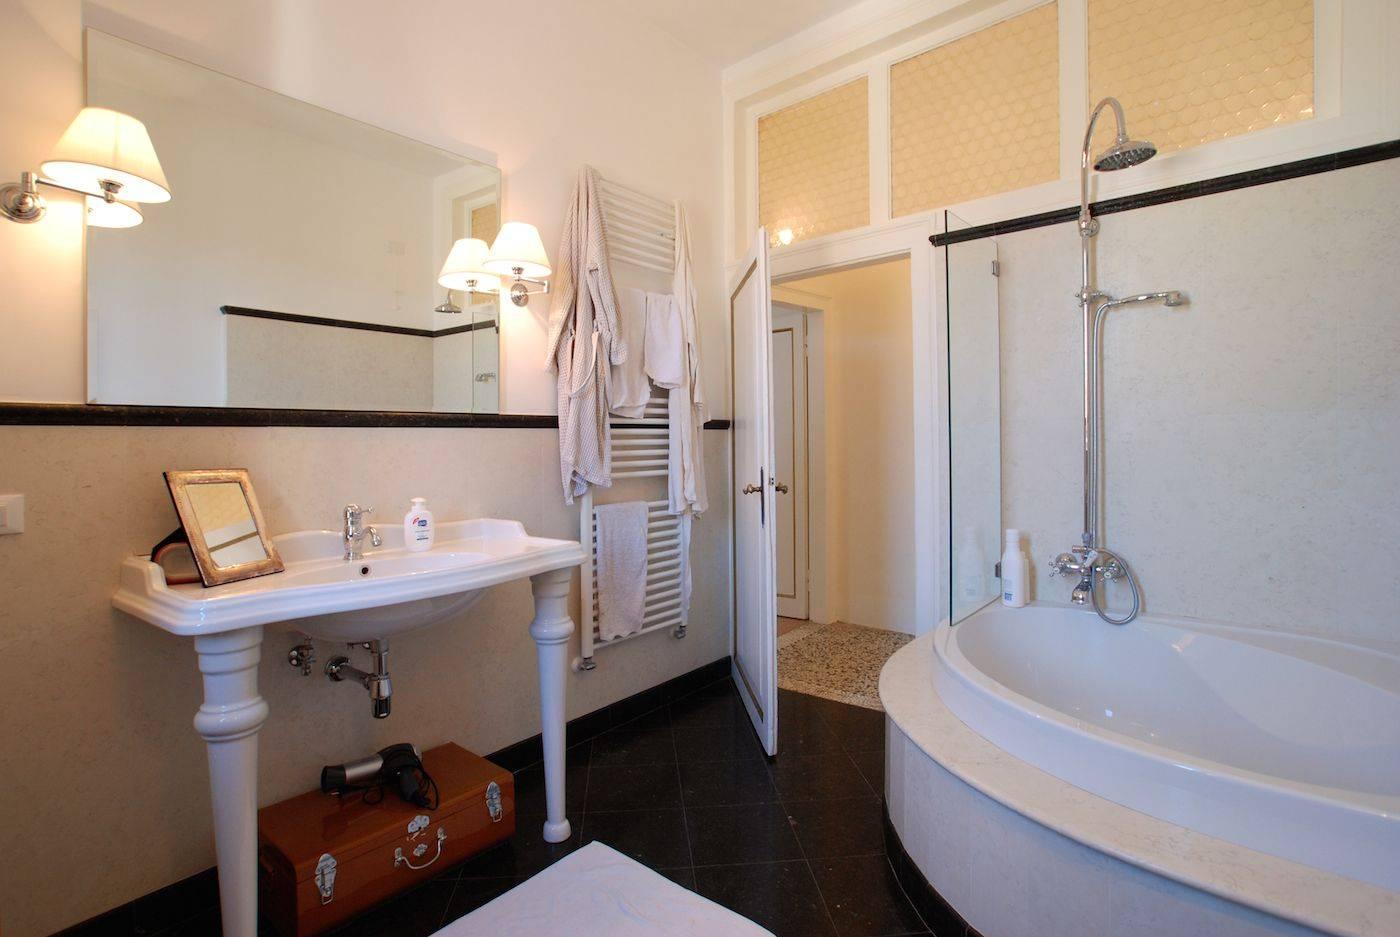 large bathroom with thub